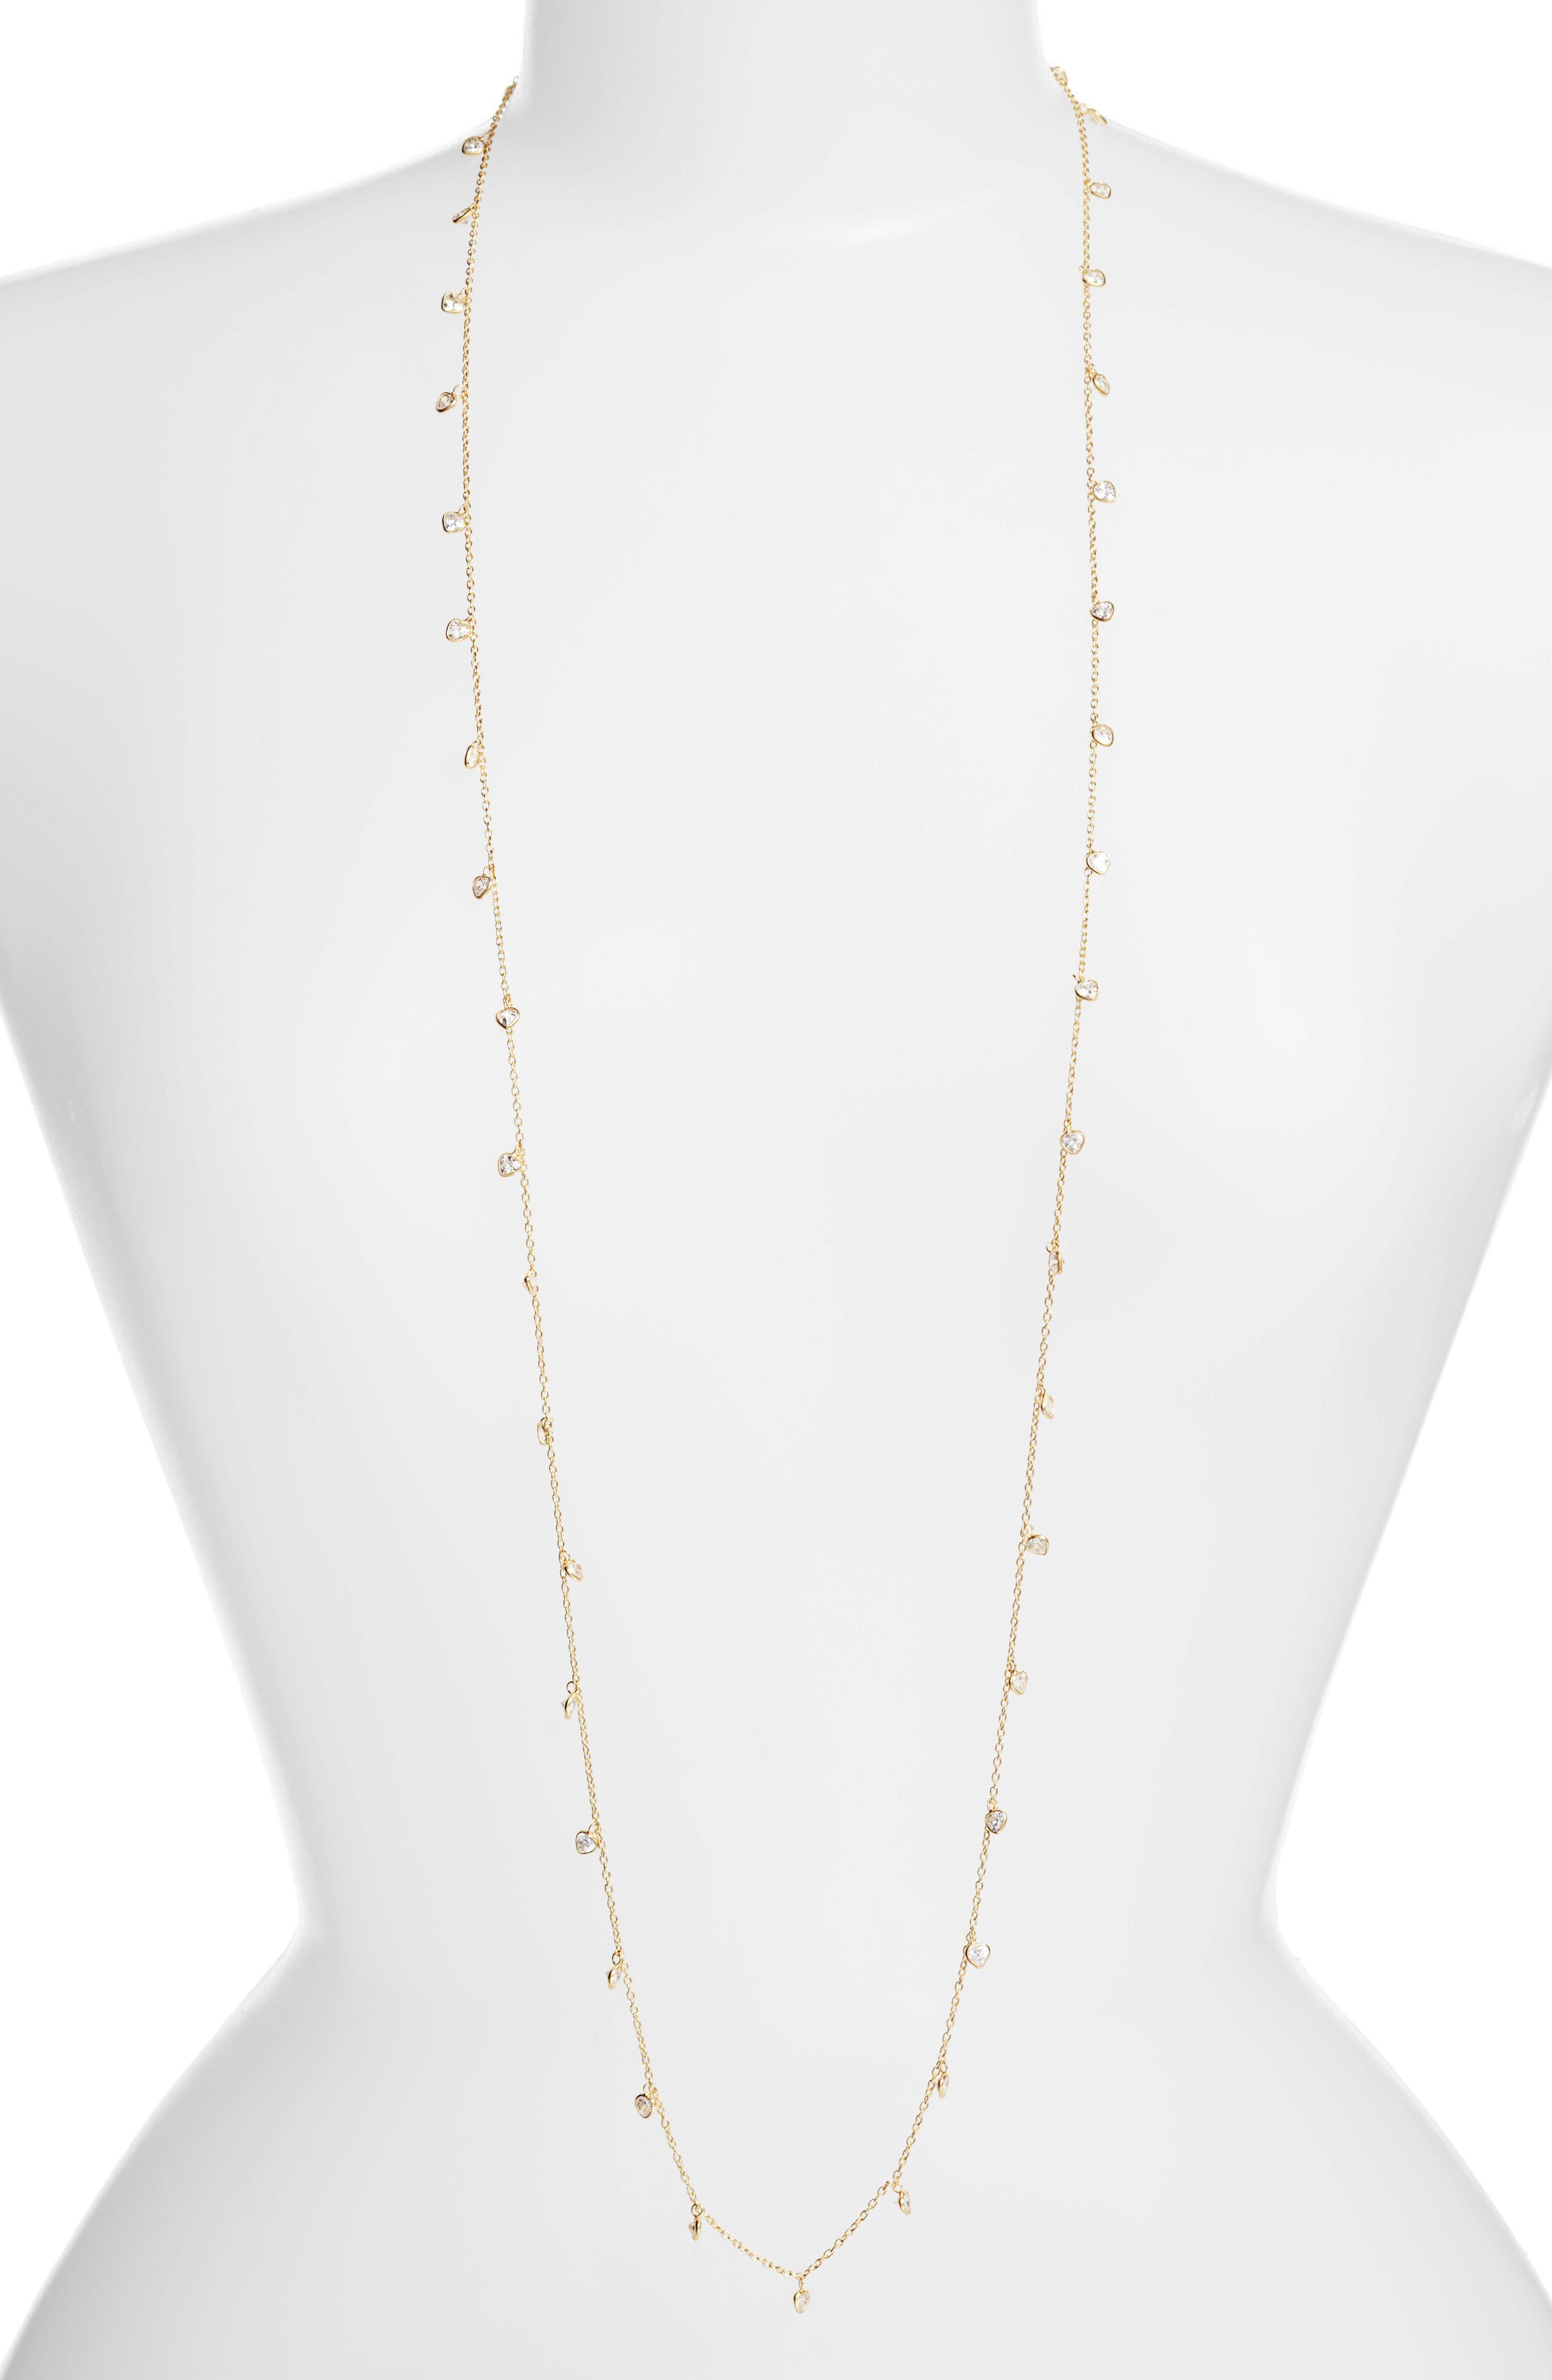 Diana Cubic Zirconia Necklace,                         Main,                         color, Gold